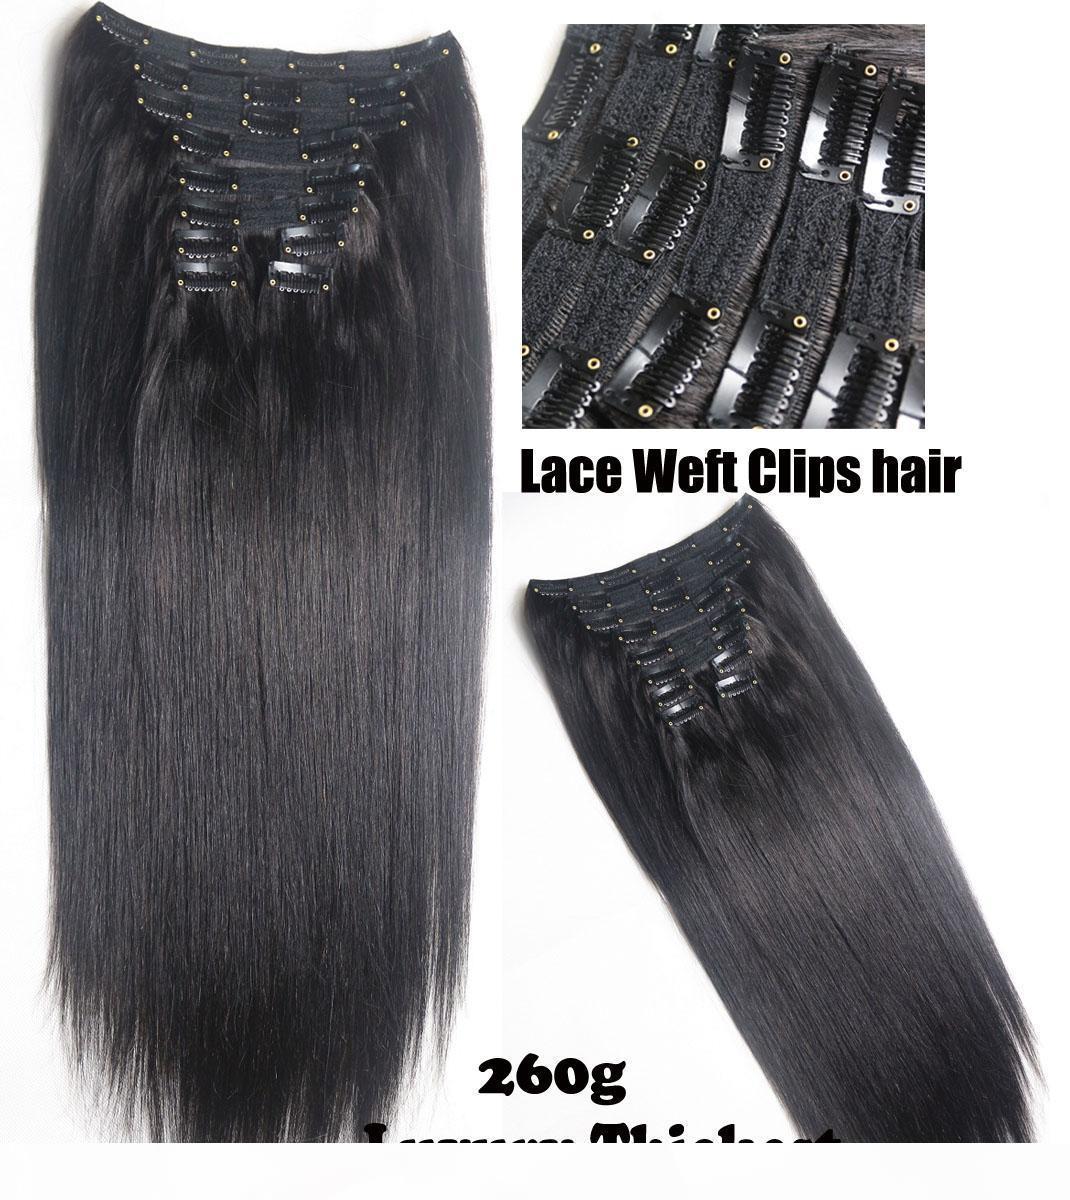 "İnsan Saç Uzantısı 10pcs seti Dantel Çift Atkı Tam Kafa 250g 300g 350g 400g üzerinde 20 ""-28"" % 100 Brezilyalı Remy İnsan saçı Klipler"